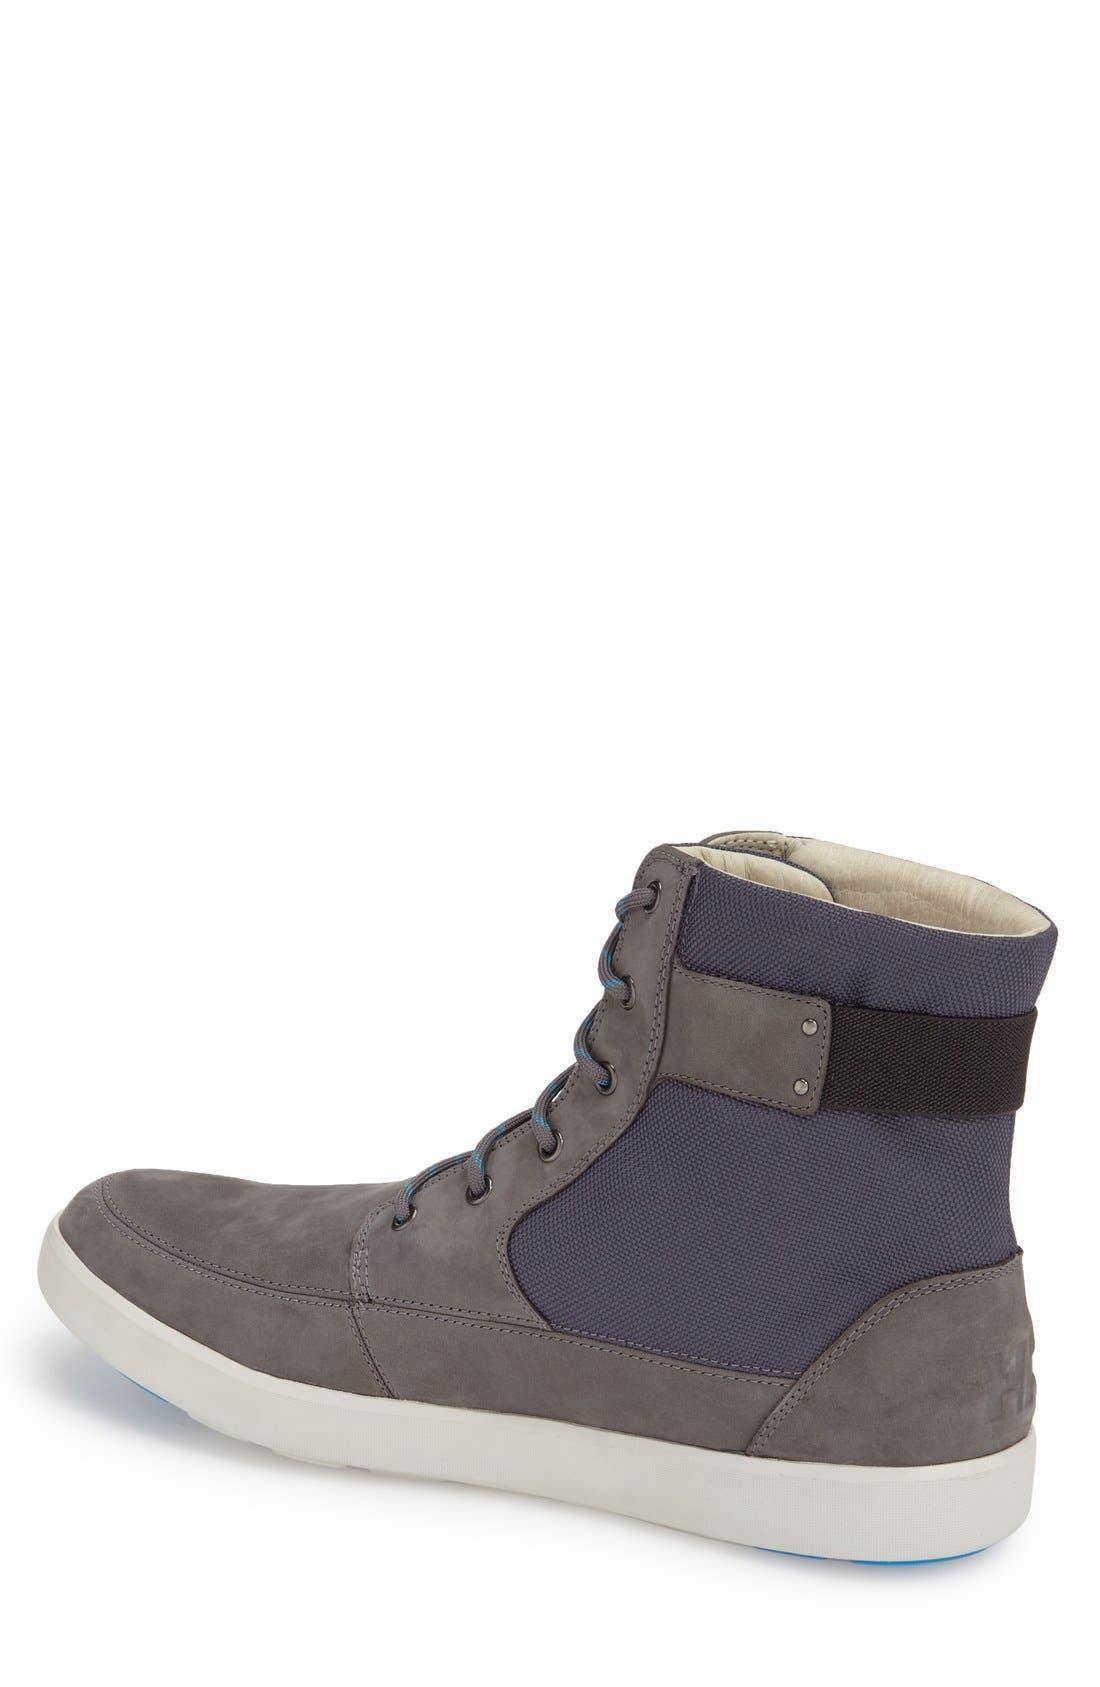 'Stockholm' Waterproof High Top Sneaker,                             Alternate thumbnail 5, color,